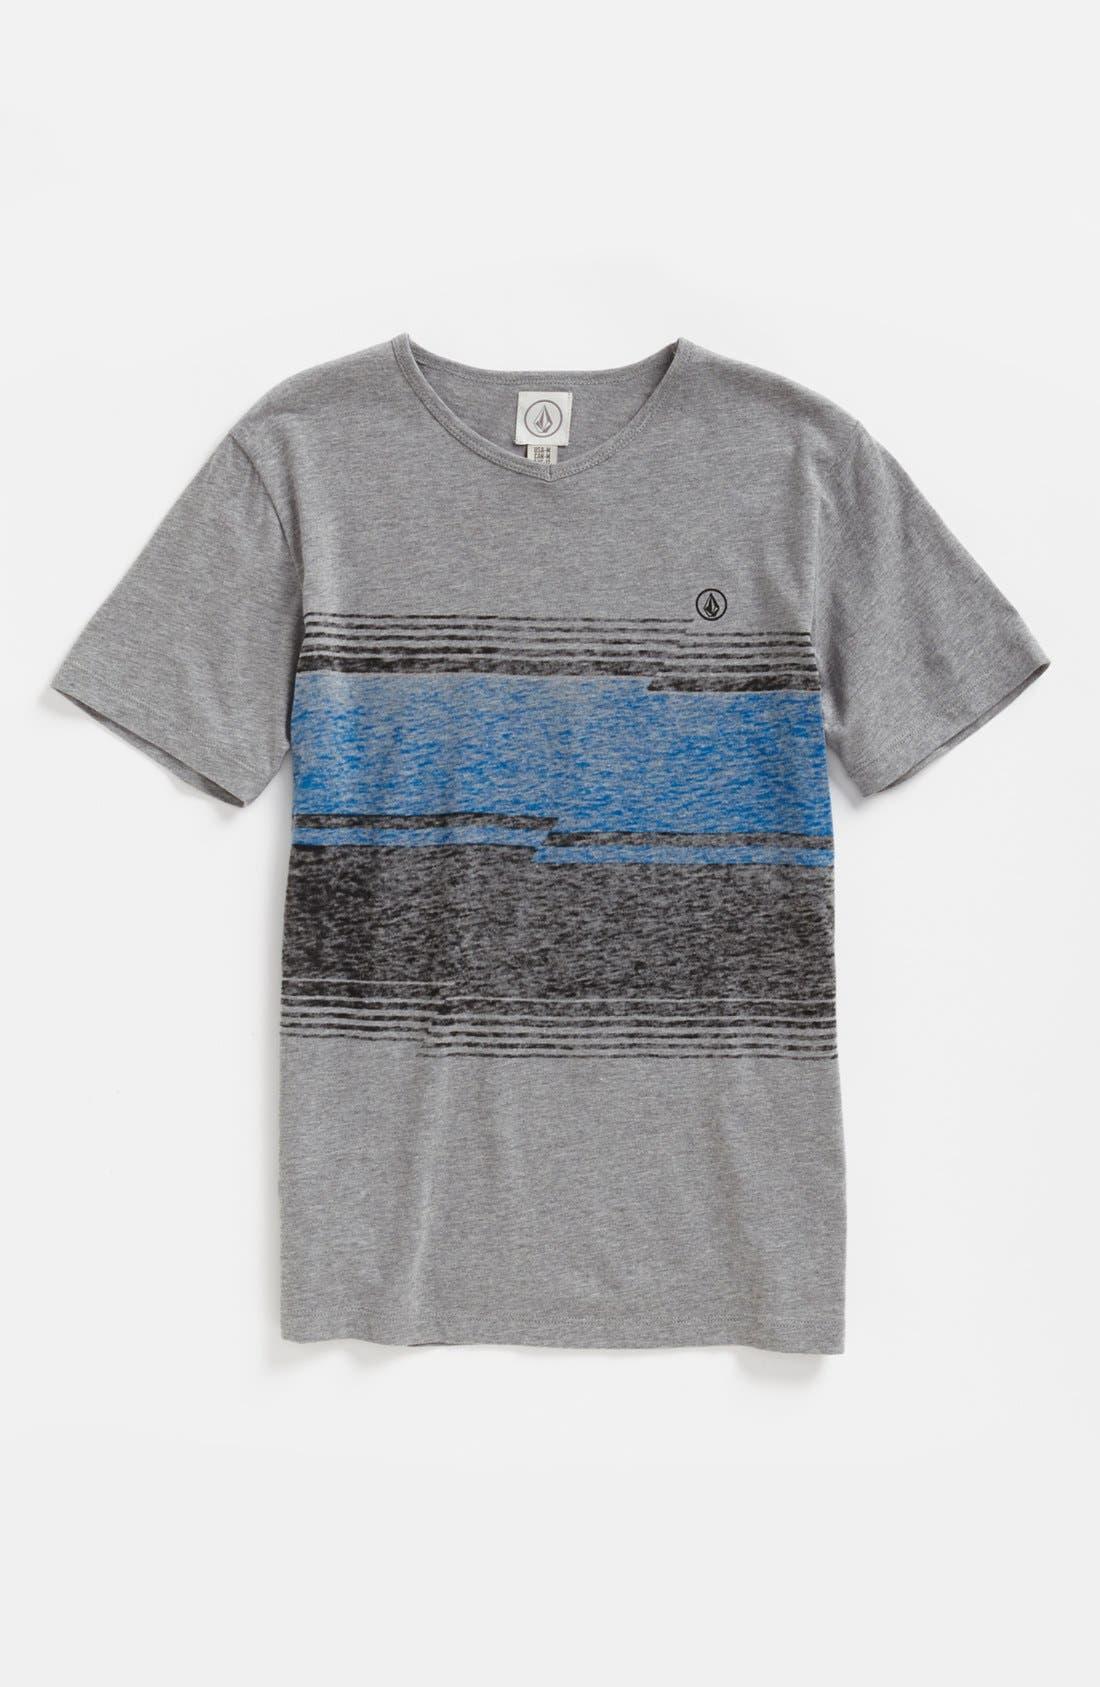 Main Image - Volcom 'Inferno' T-Shirt (Big Boys)